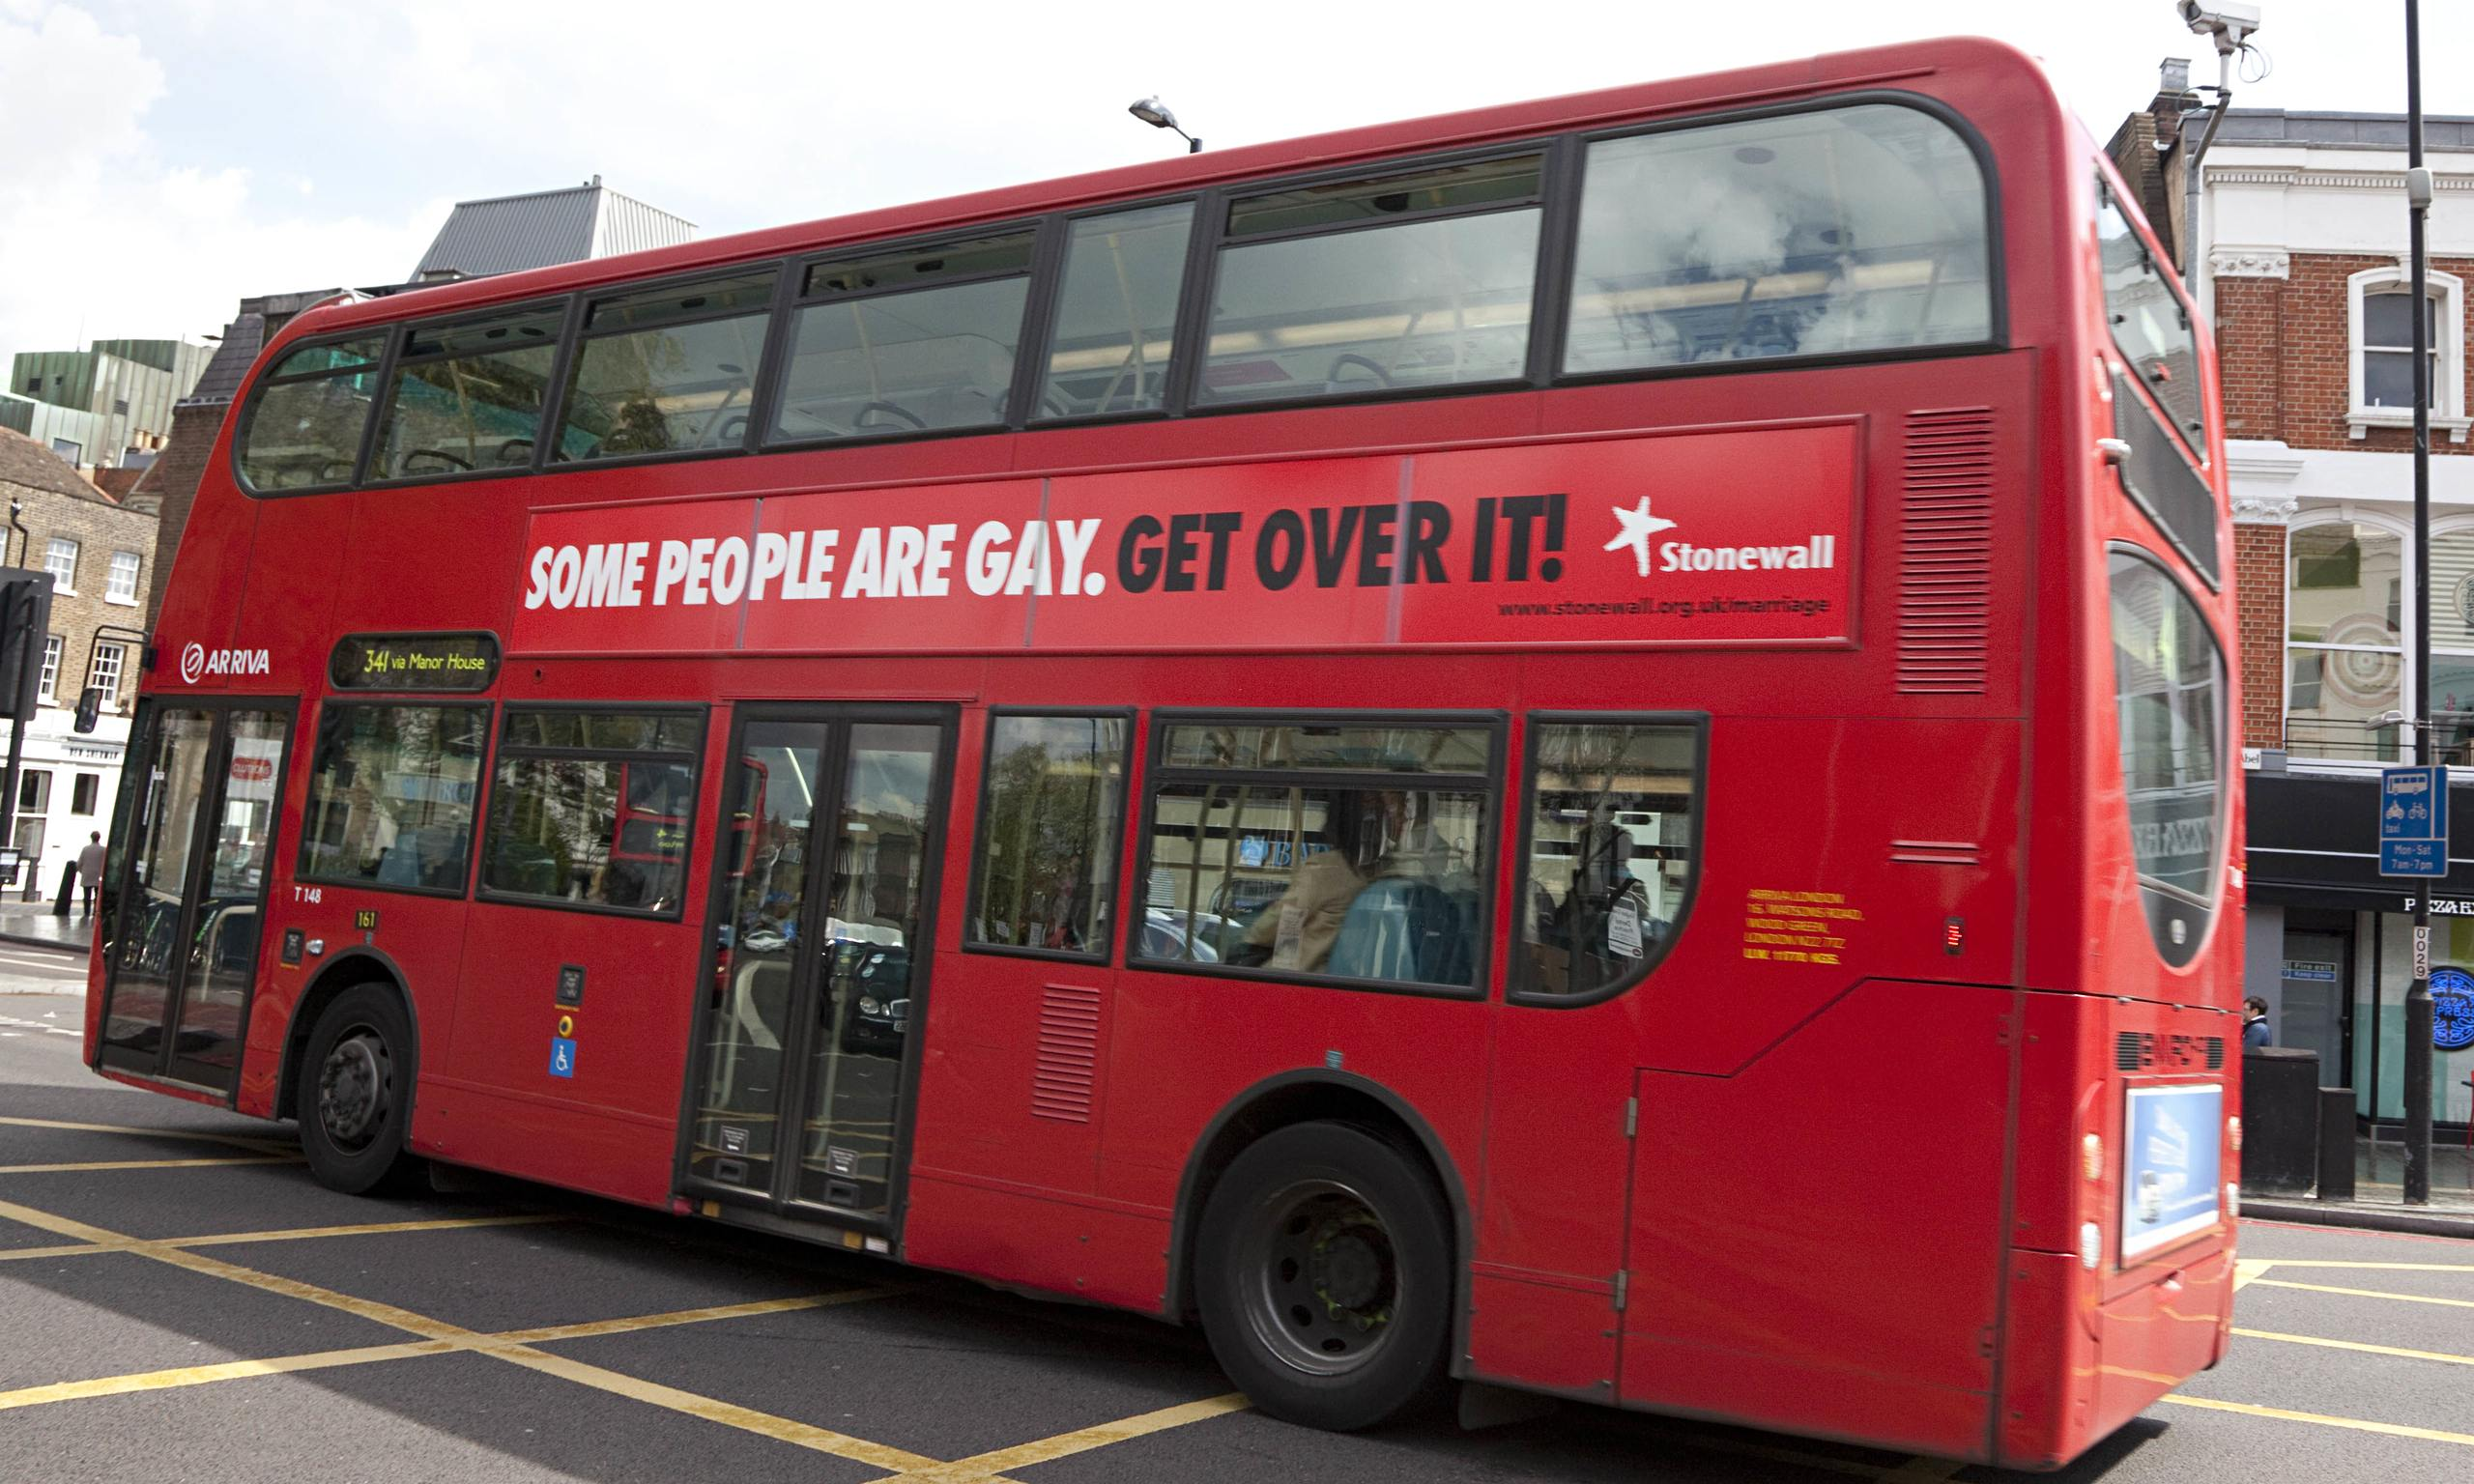 from Keagan stonewall gay charity organisation